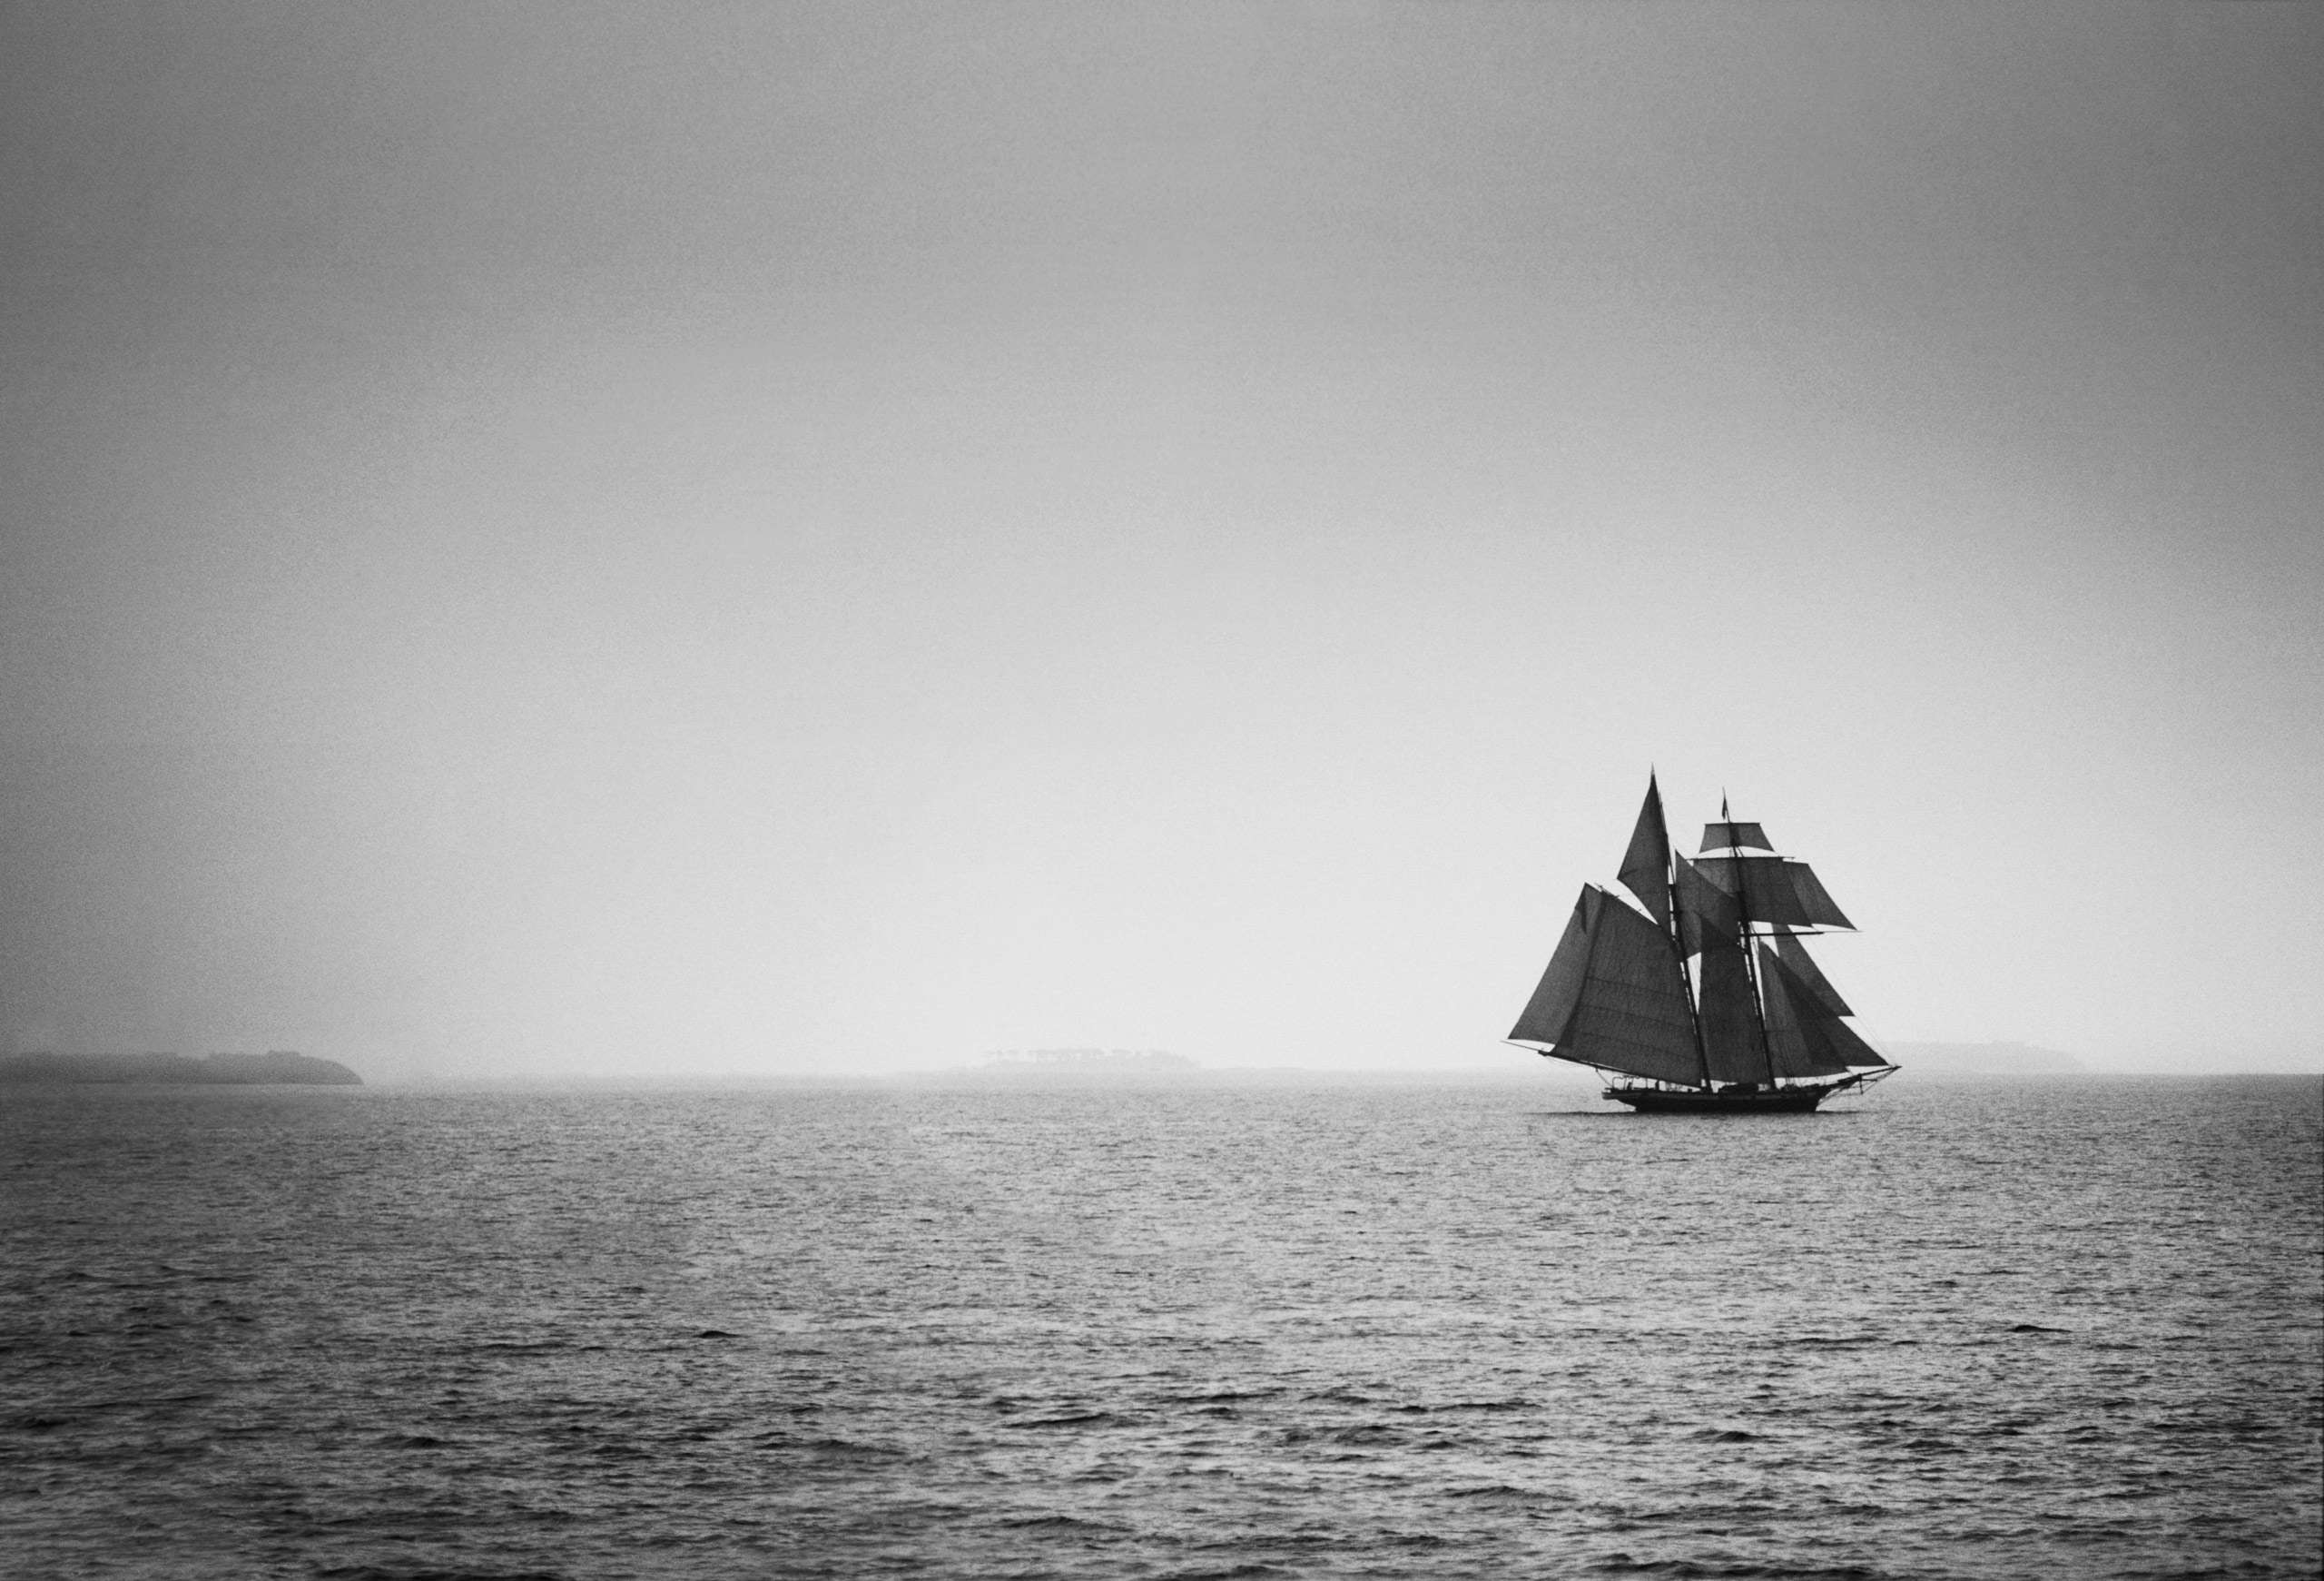 PORTFOLIO - Sailing - Tall Ships #26-PCG078